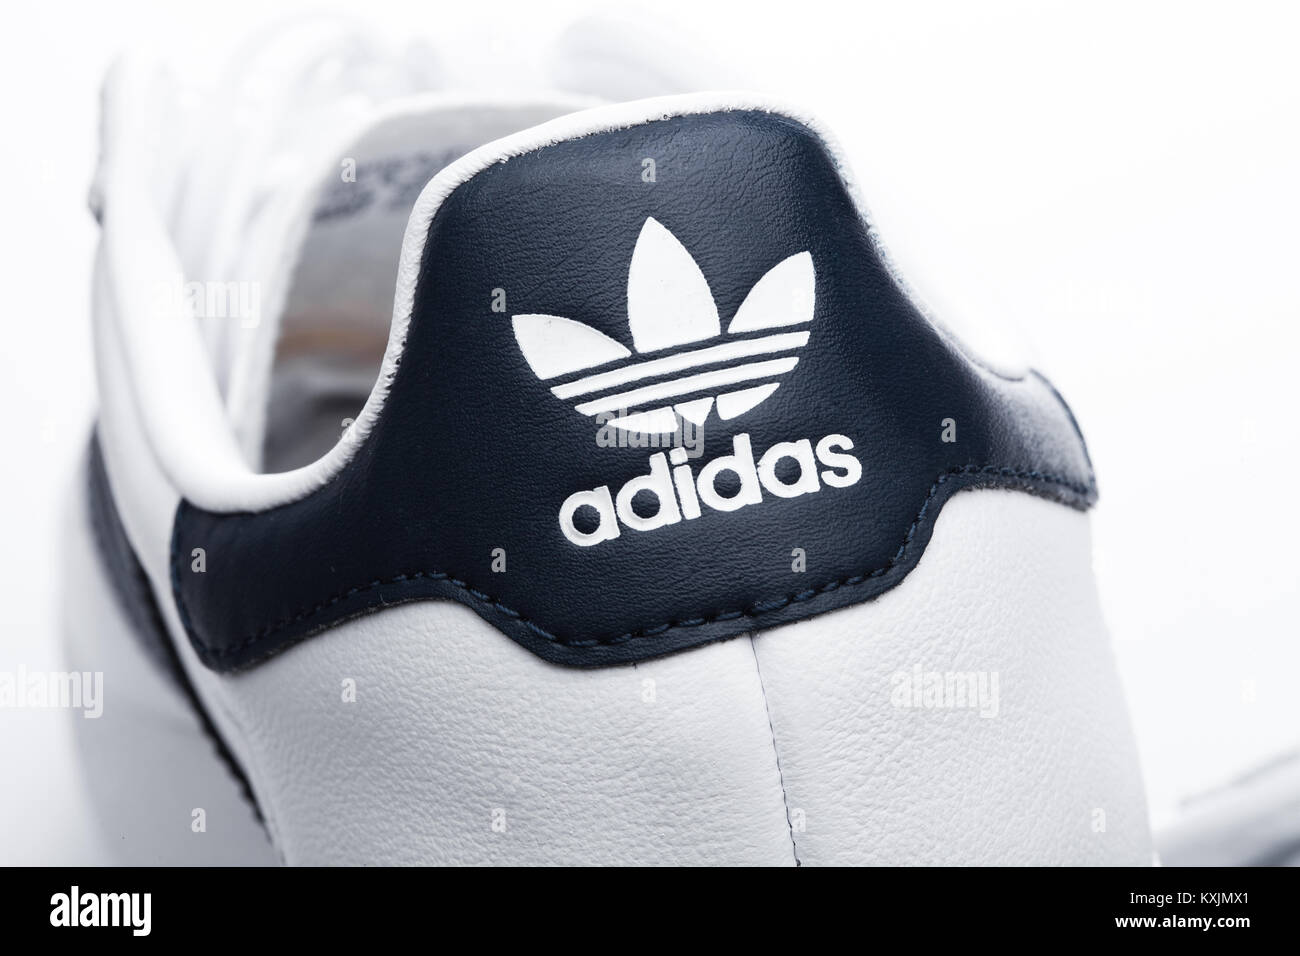 Londres, UK janvier 02, 2018 : Adidas Originals chaussures